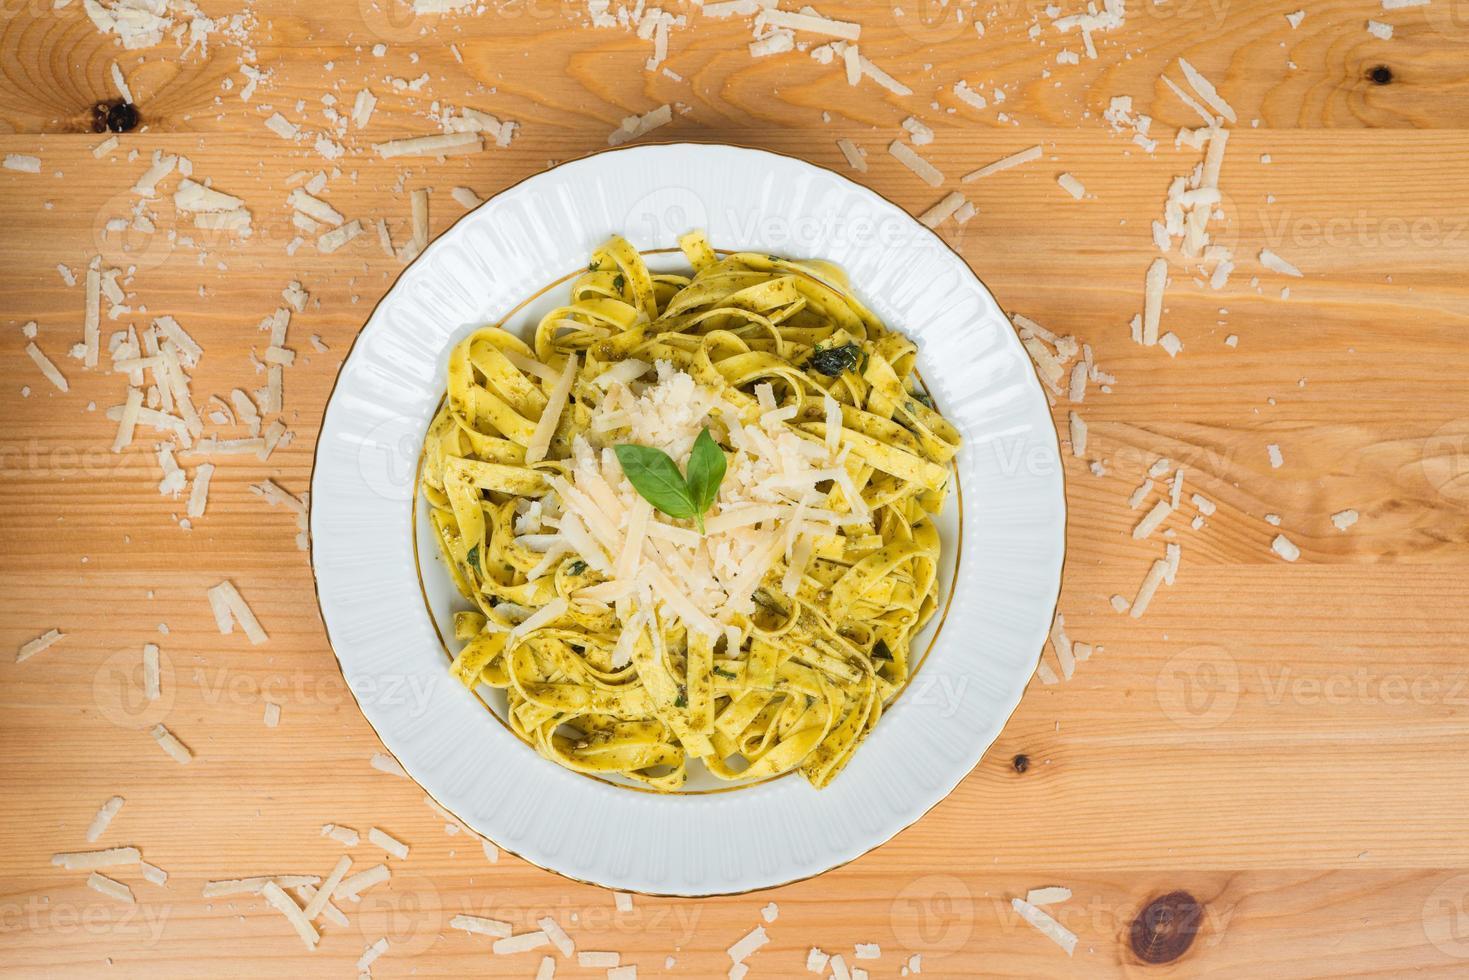 Tagliatelle pasta with pesto sauce photo